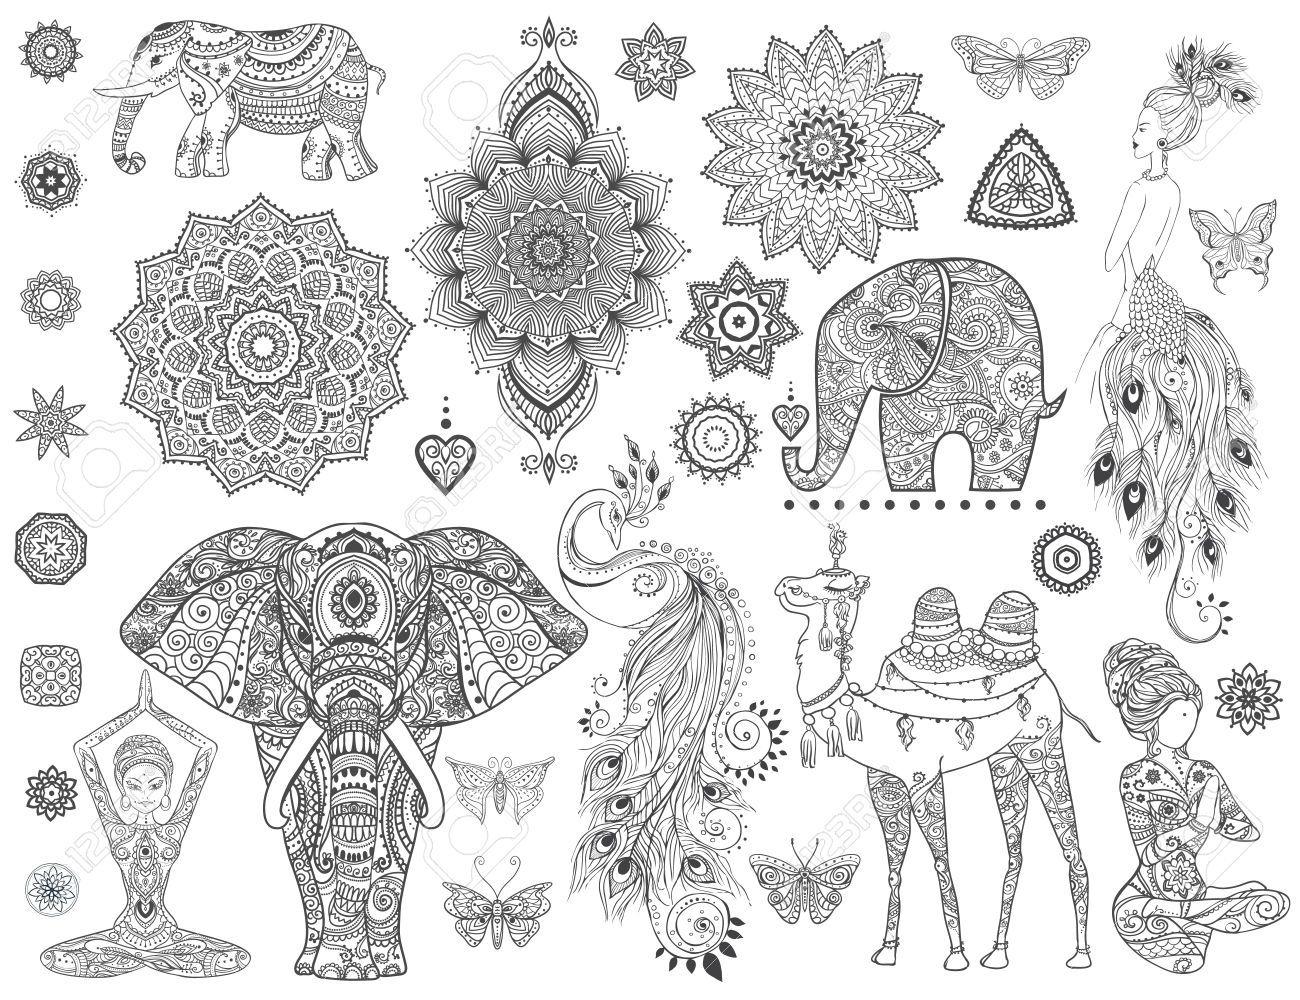 Stock Photo (Mit Bildern) | Mandala Tiere, Mandala Tiere in Tier Mandalas